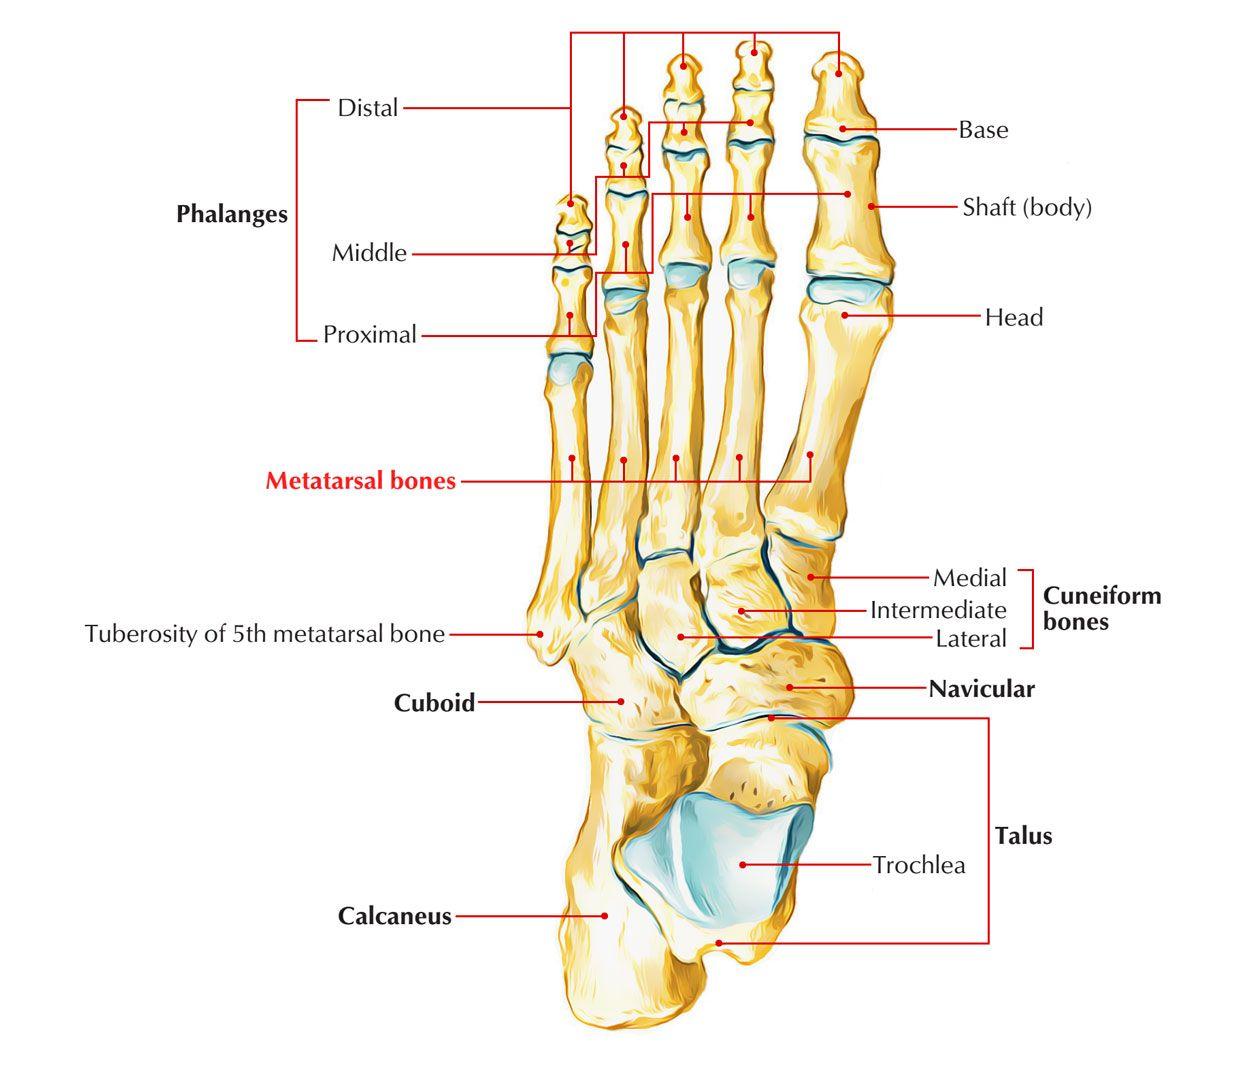 Metatarsal Bones Bones Quadrilaterals Jones Fracture